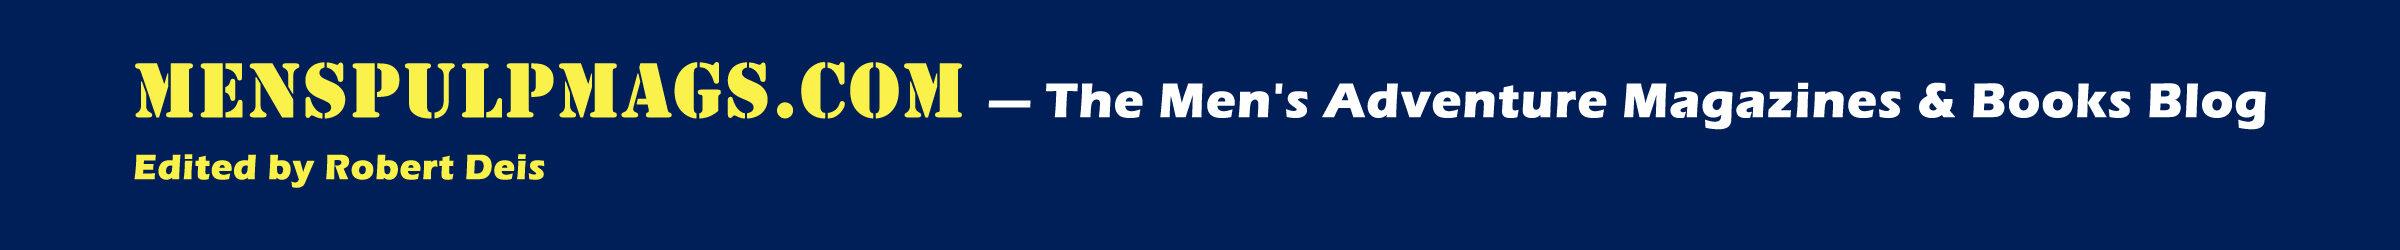 The Men's Adventure Magazines Blog